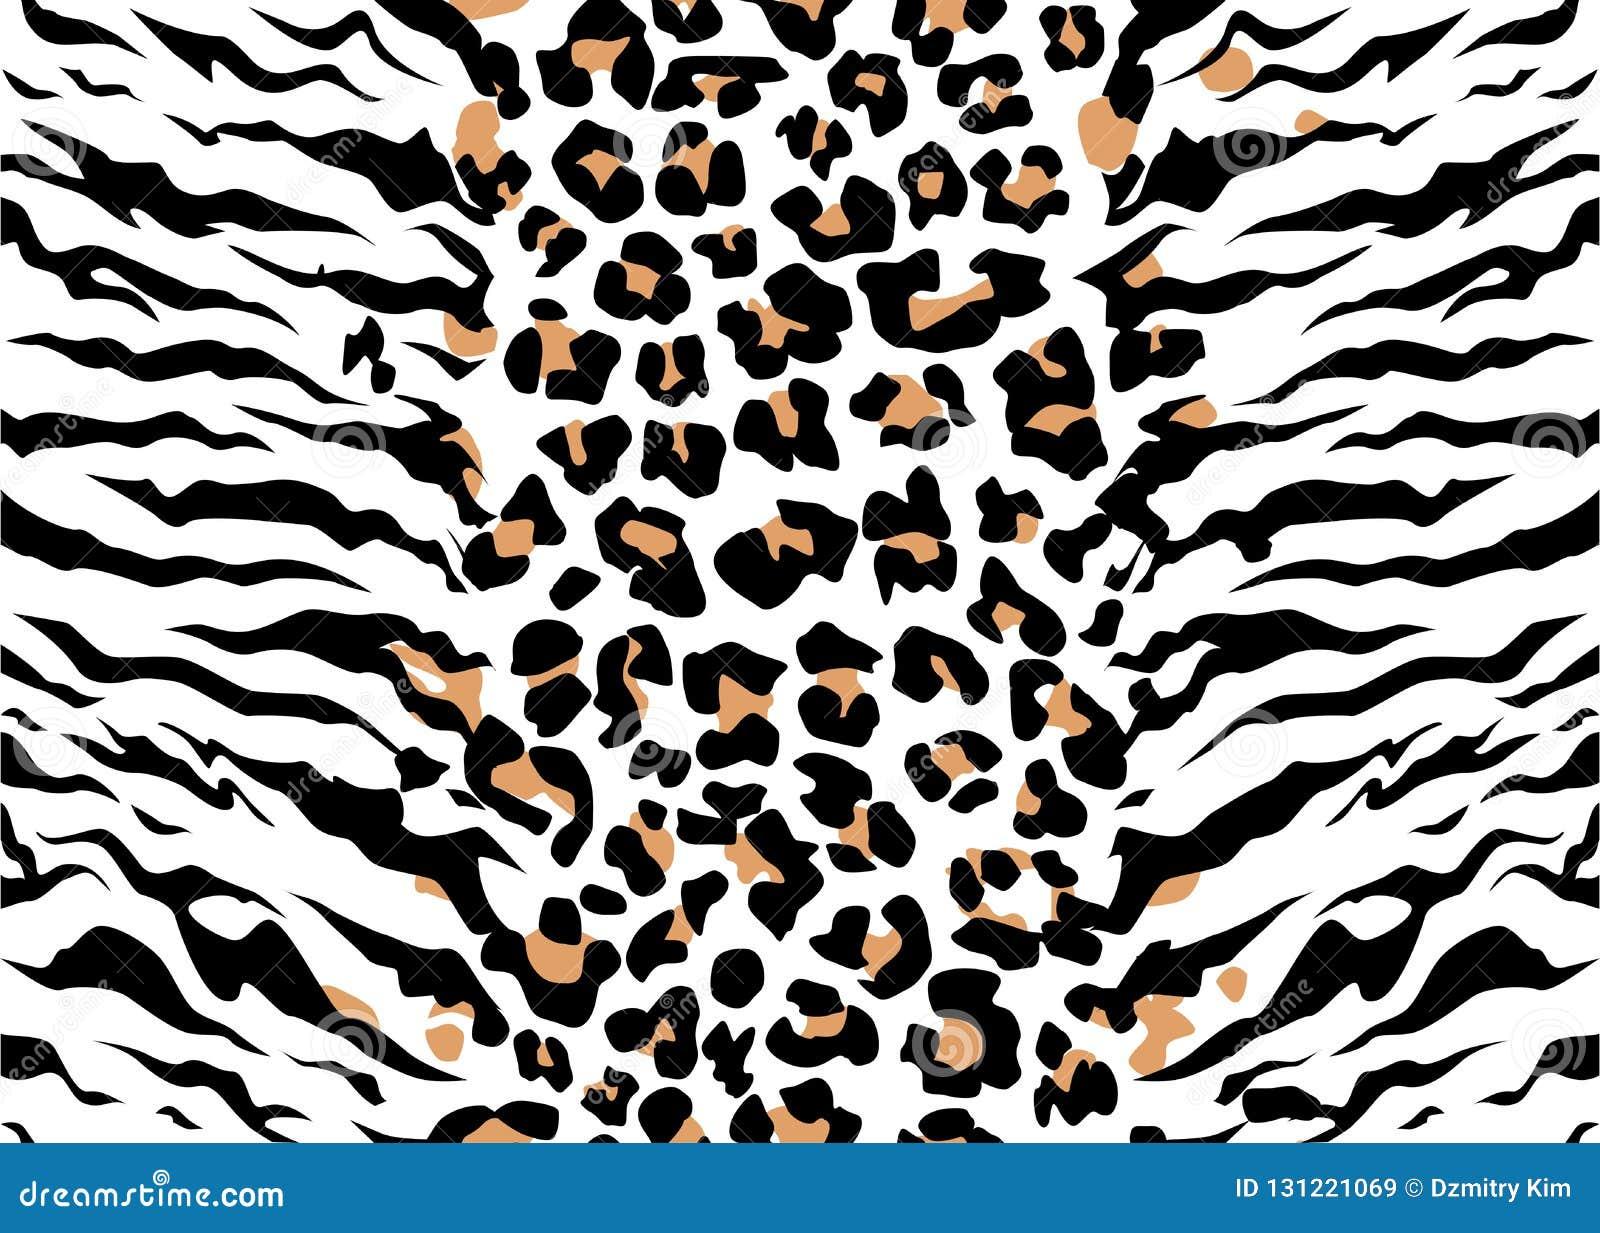 vector leopard tiger jaguar texture abstract background orange and white black vector jungle bengal cat strip stock vector illustration of safari black 131221069 https www dreamstime com leopard tiger jaguar texture abstract background orange black vector jungle bengal cat strip image illustration white image131221069